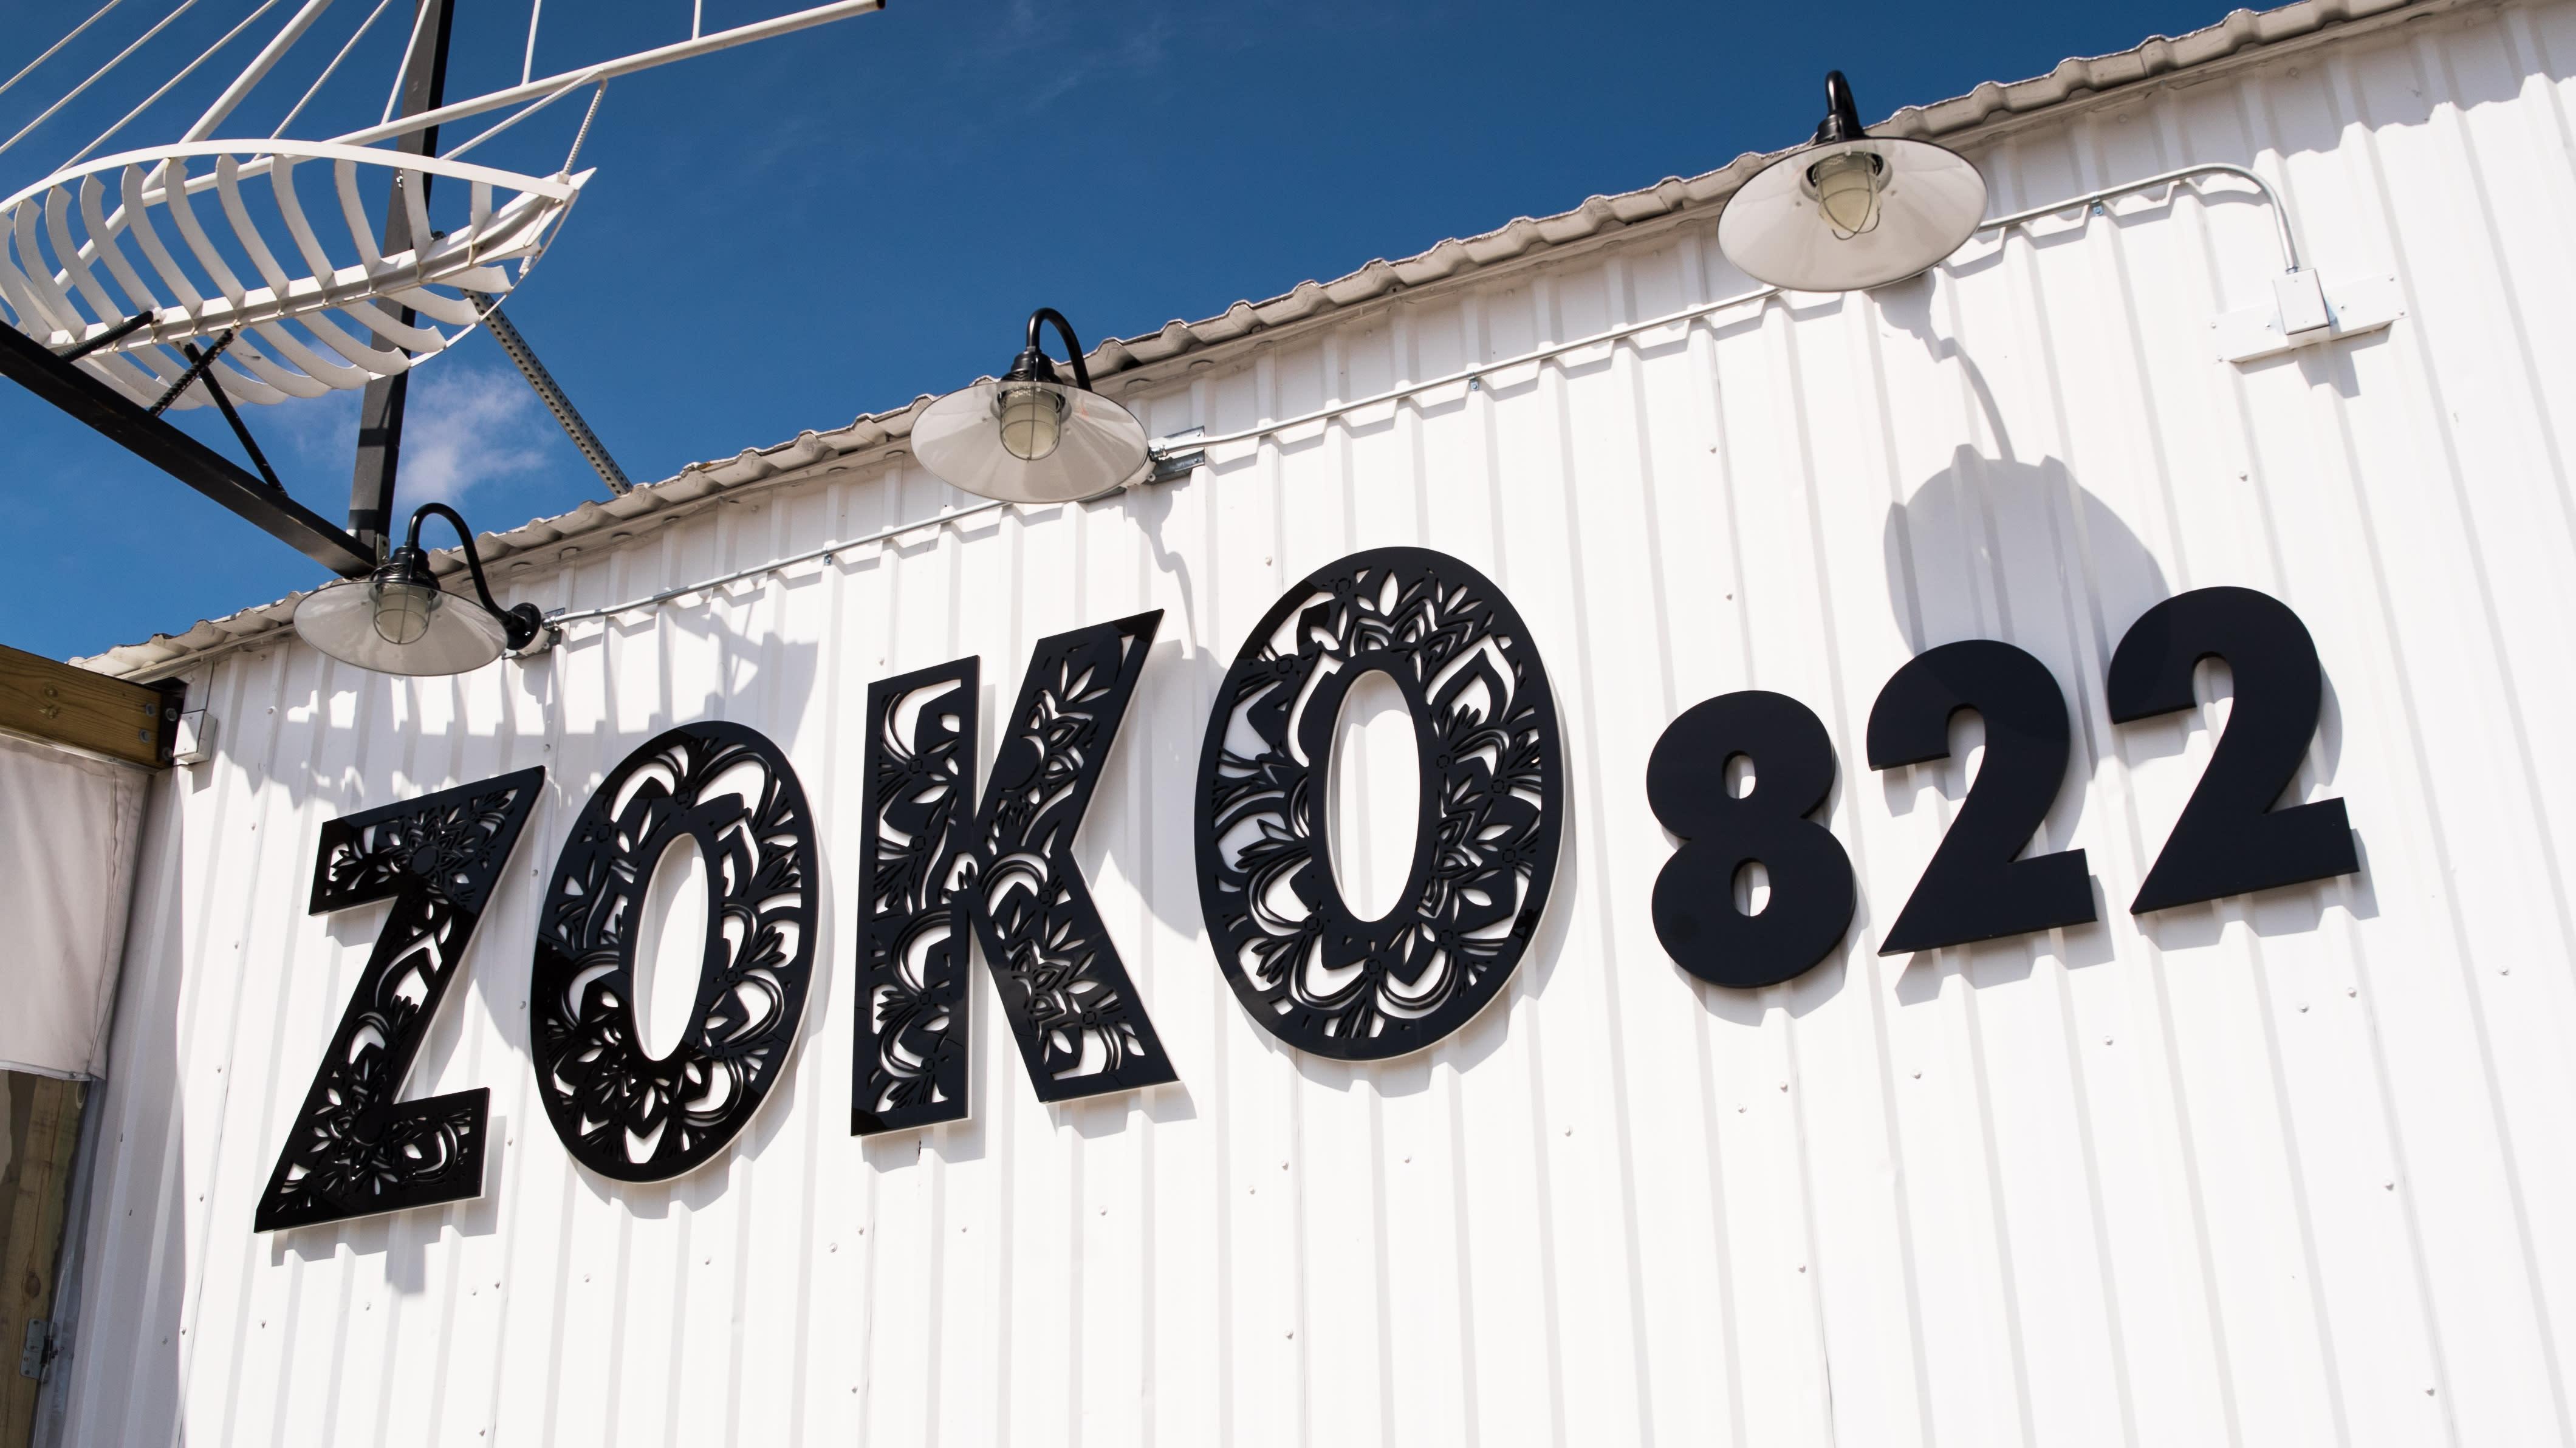 Zoko 822